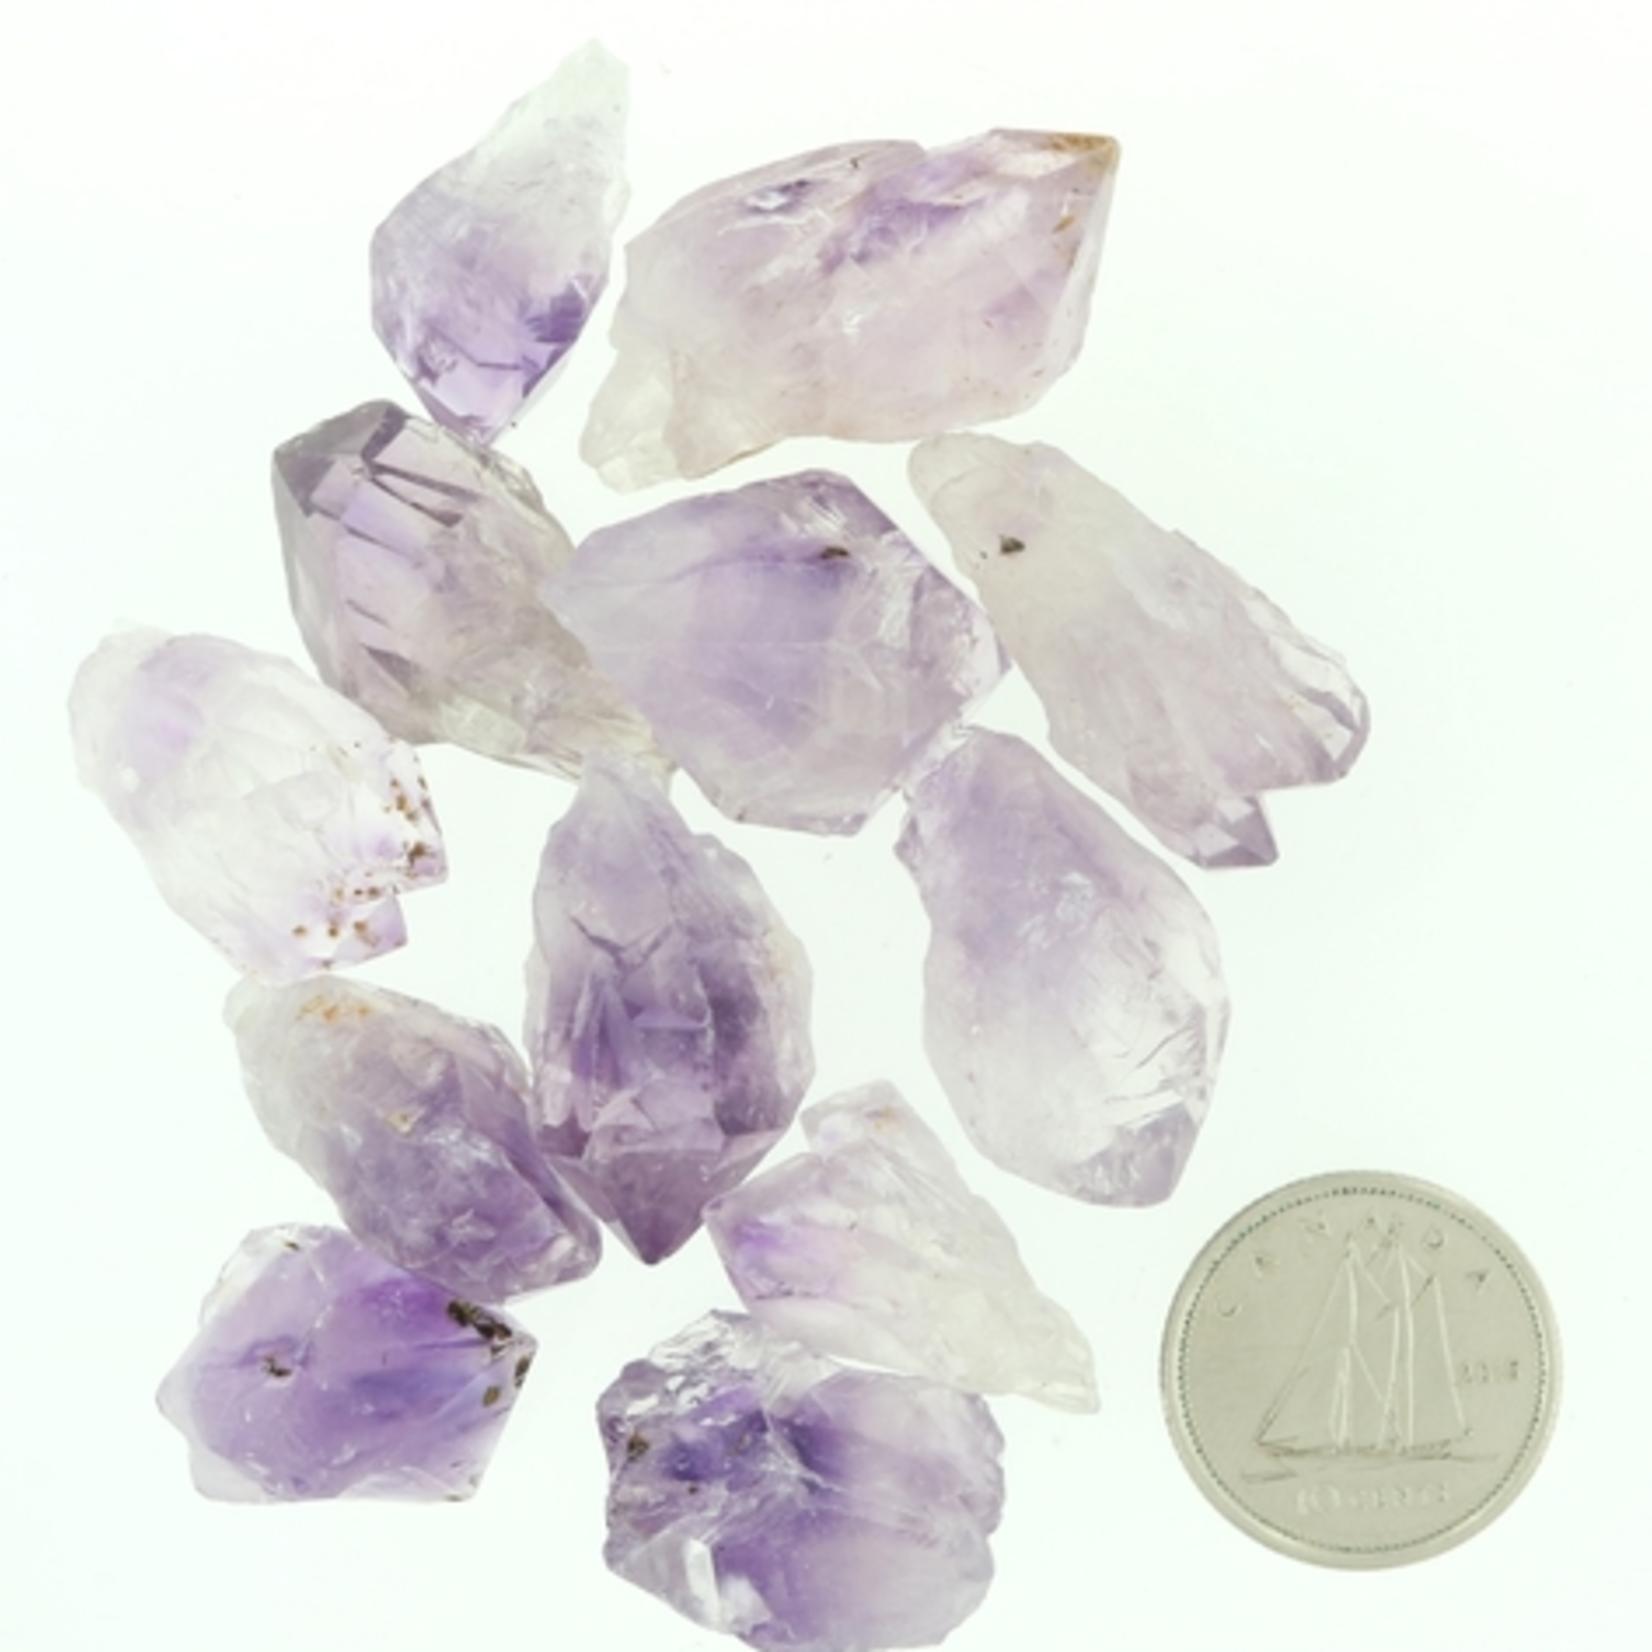 Amethyst Crystal Point -Tiny-